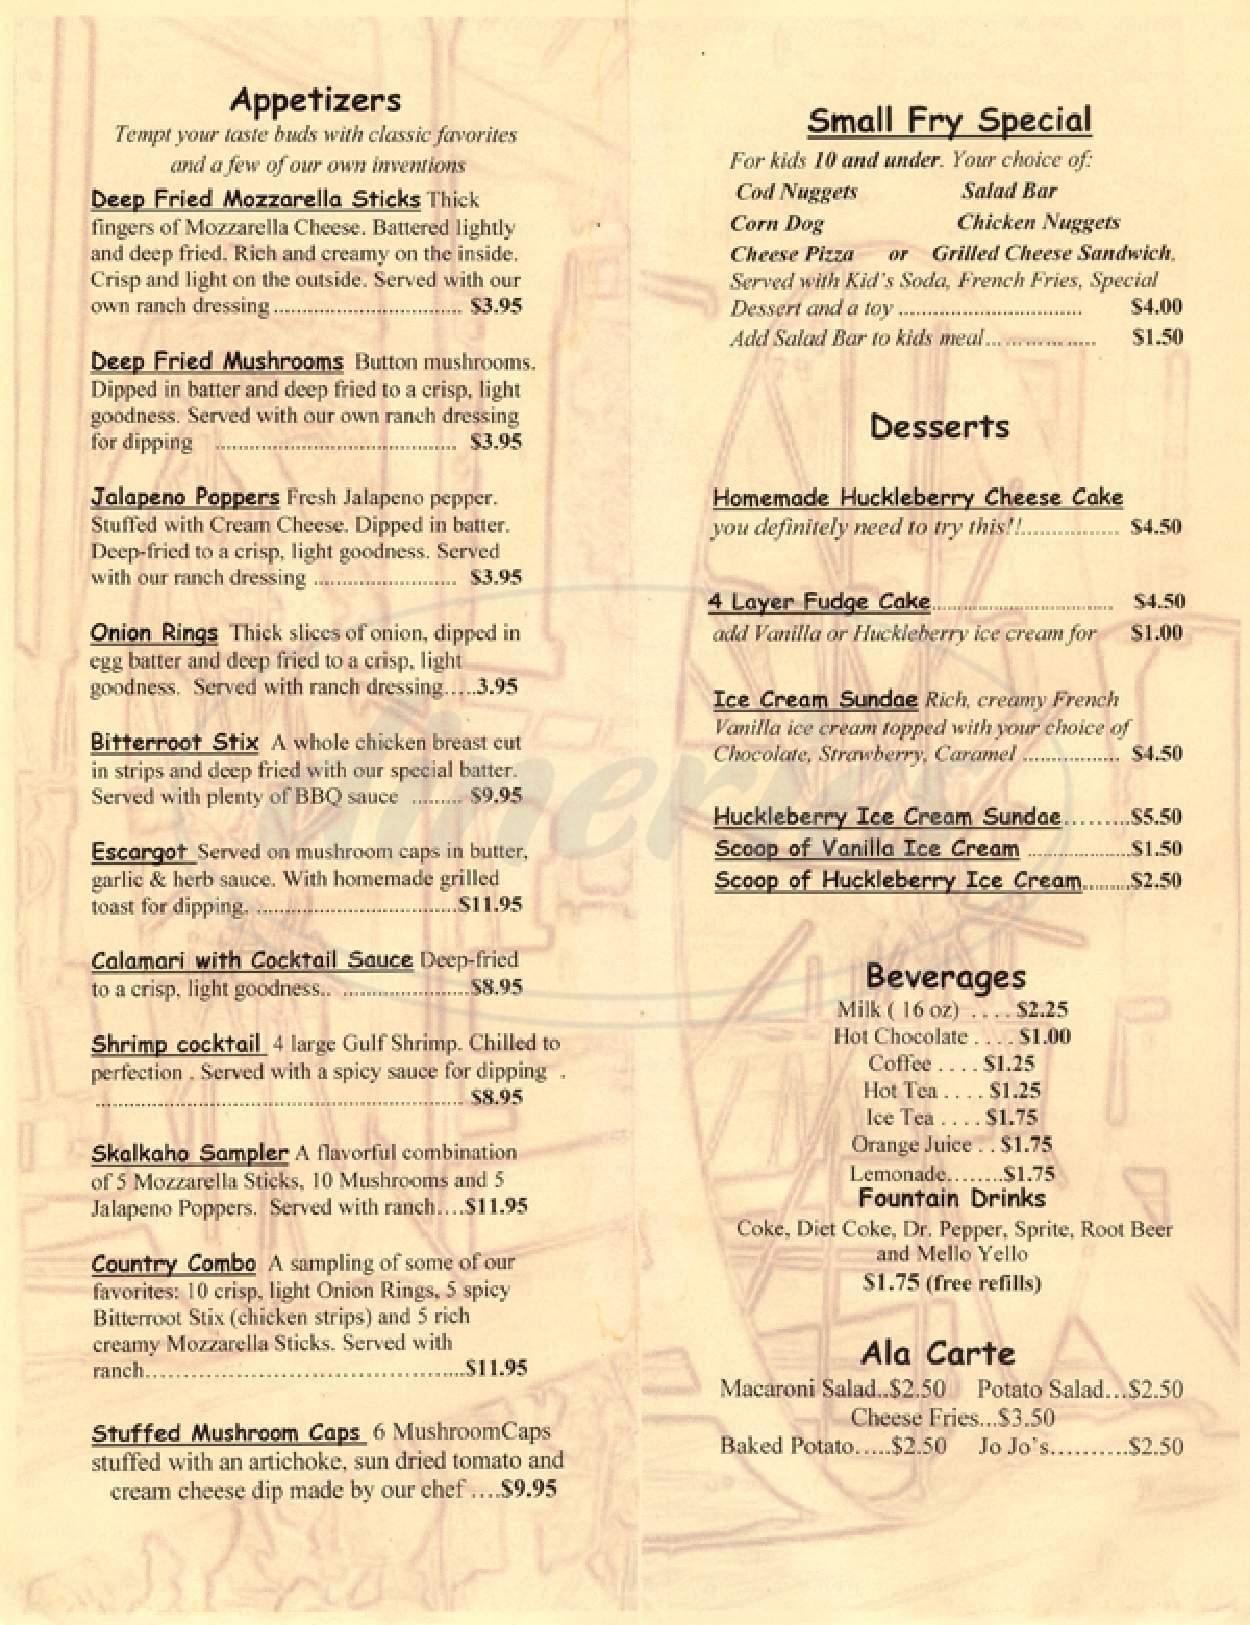 menu for Skalkaho Lodge Steakhouse